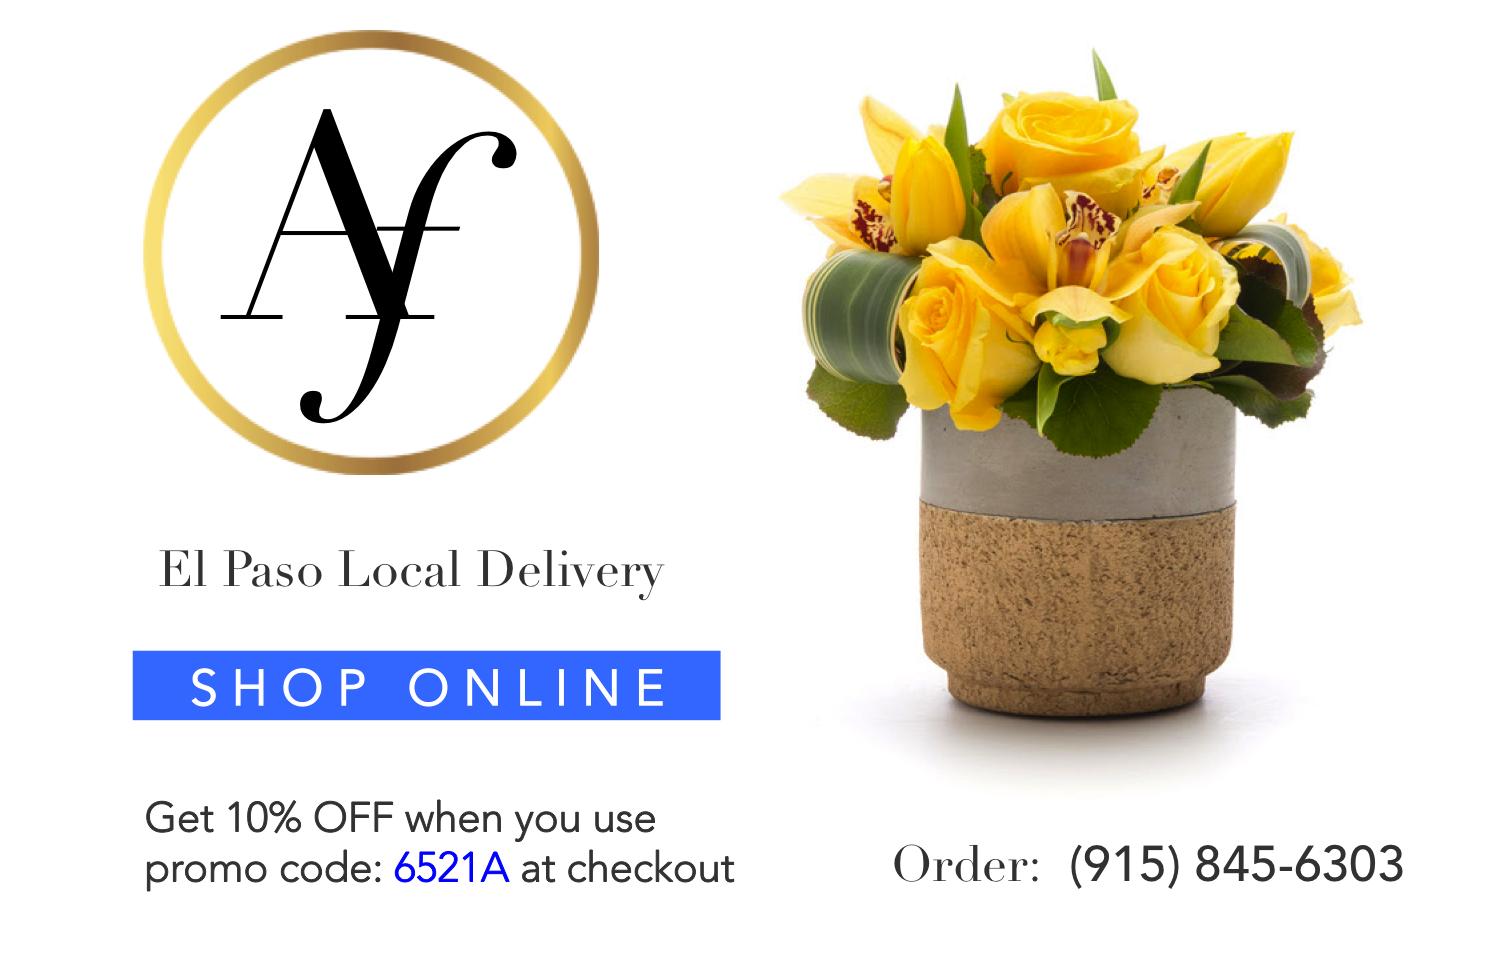 79912-angies-2-floral-designs-el-paso-florist-79912.png